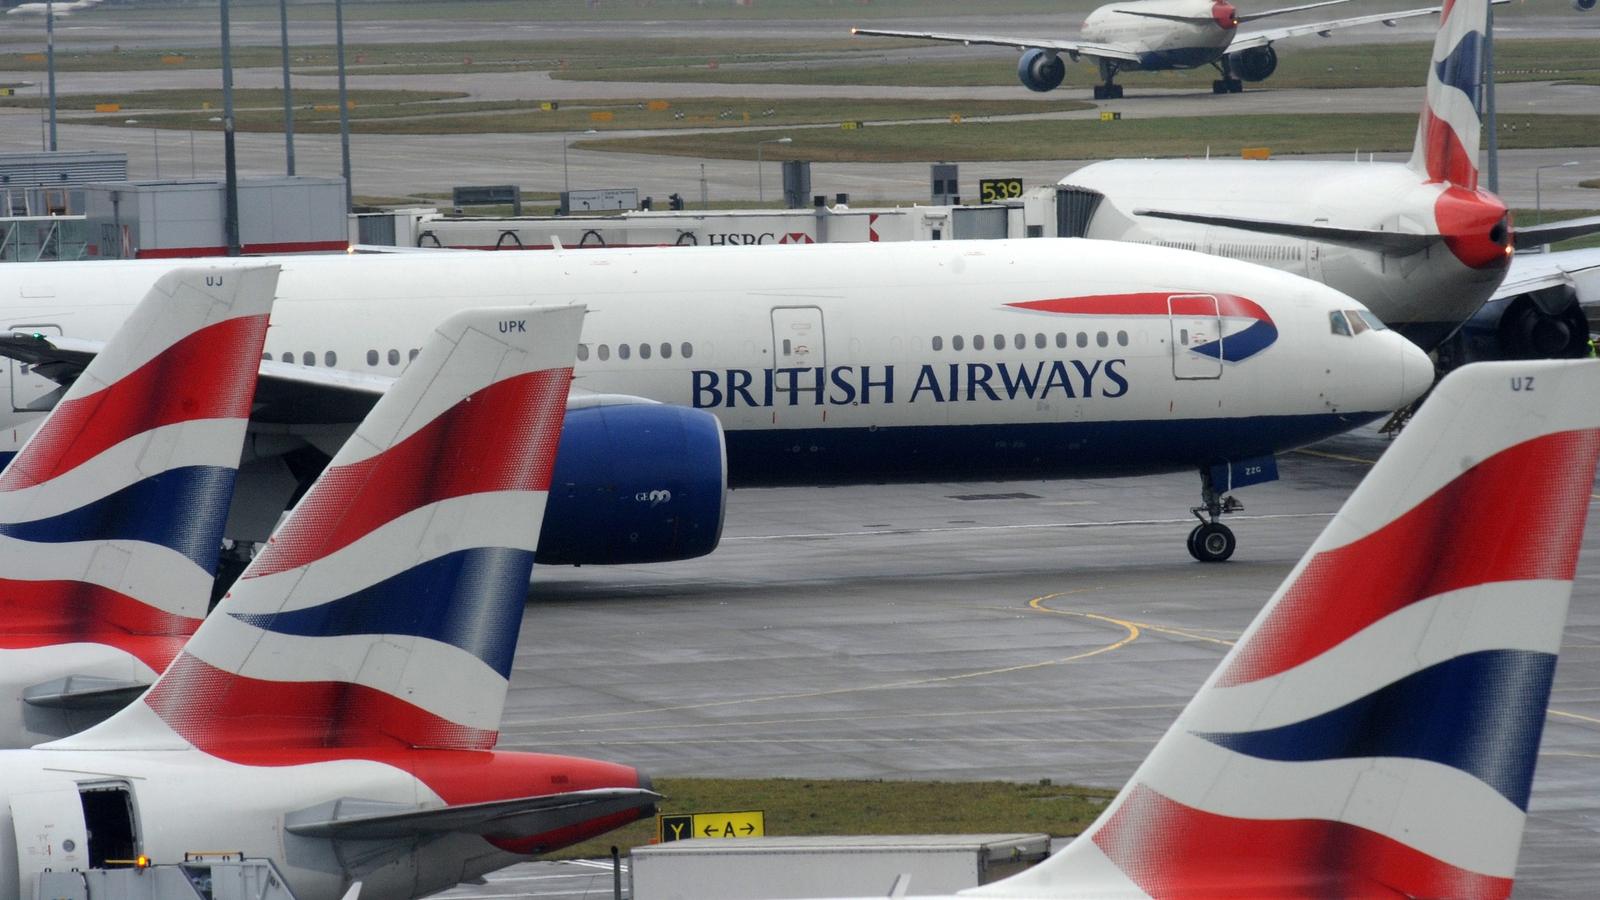 Power supply issue caused IT failure at British Airways